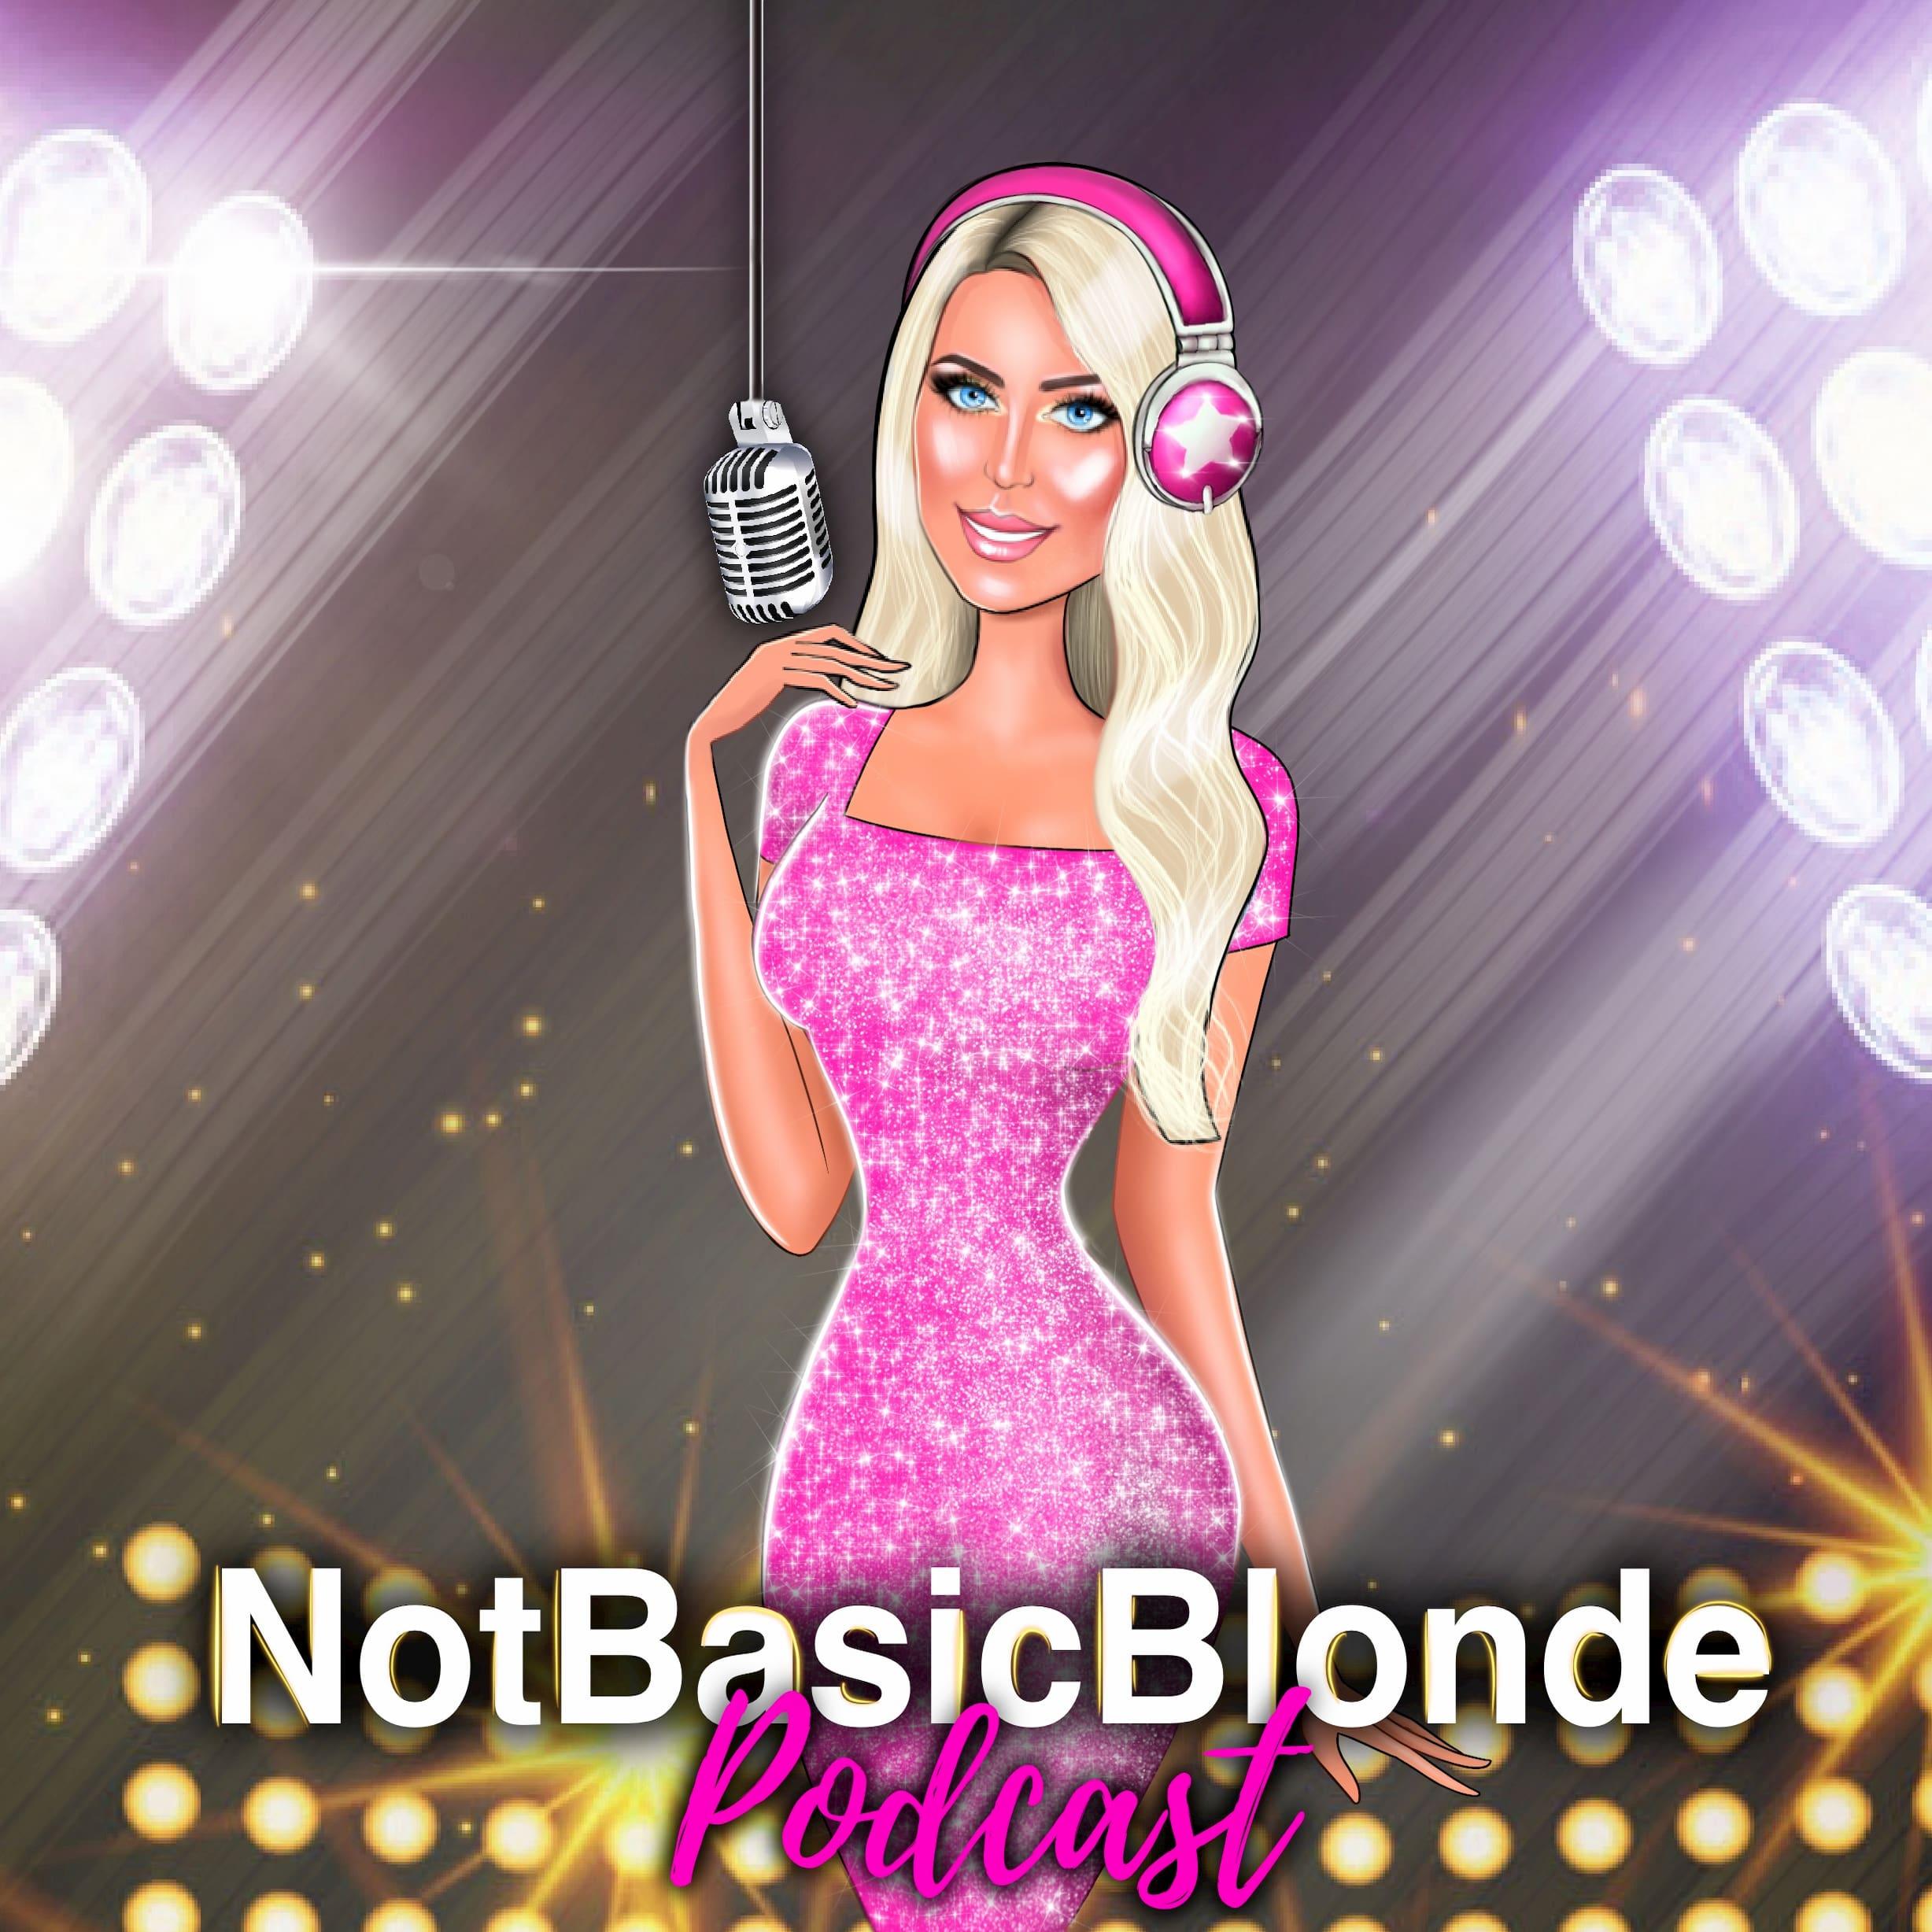 NotBasicBlonde Podcast show art